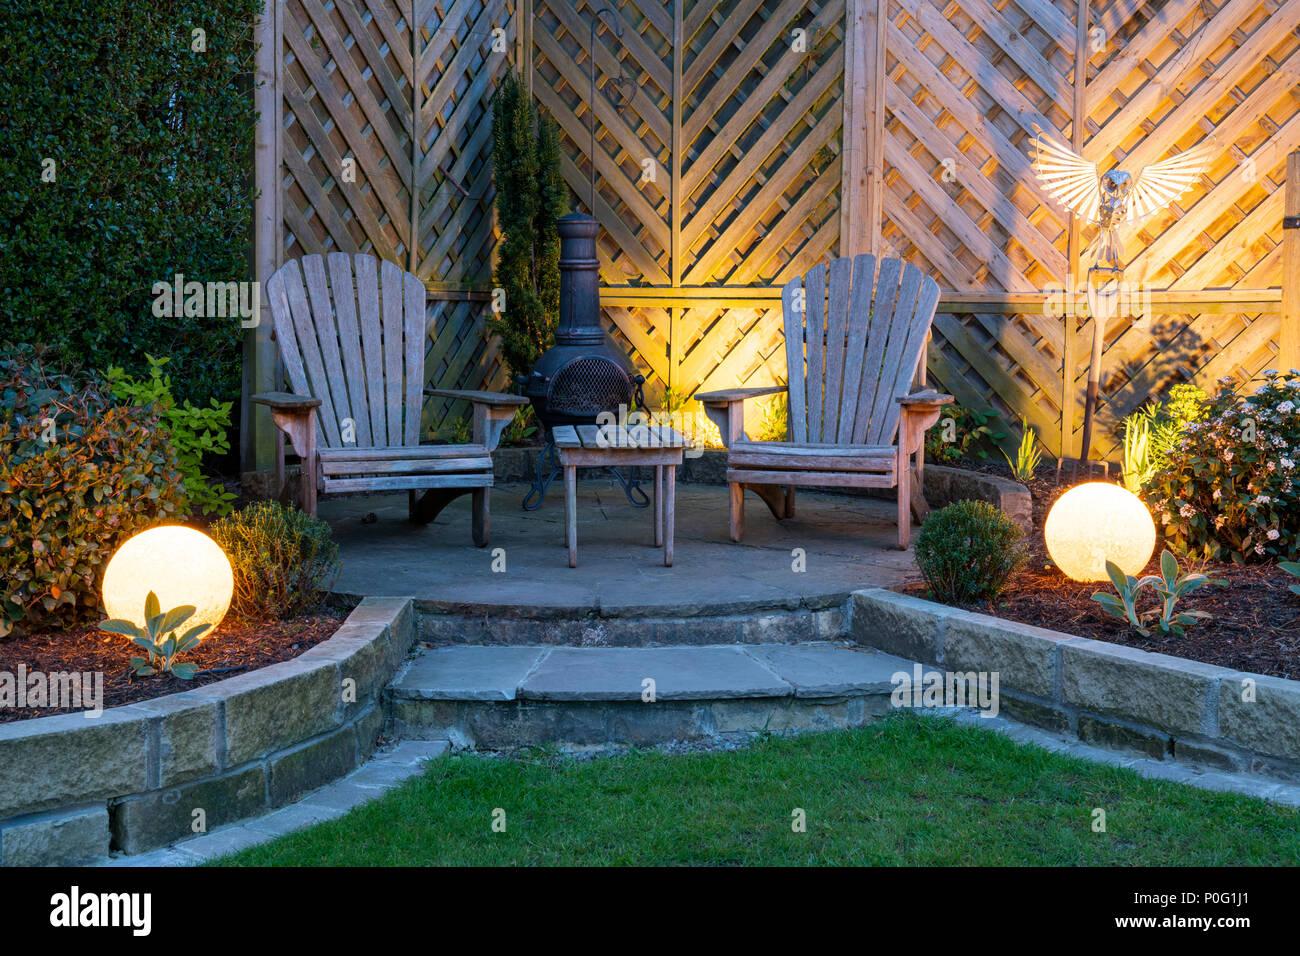 Belle, paysagé, jardin privé avec un design contemporain ...